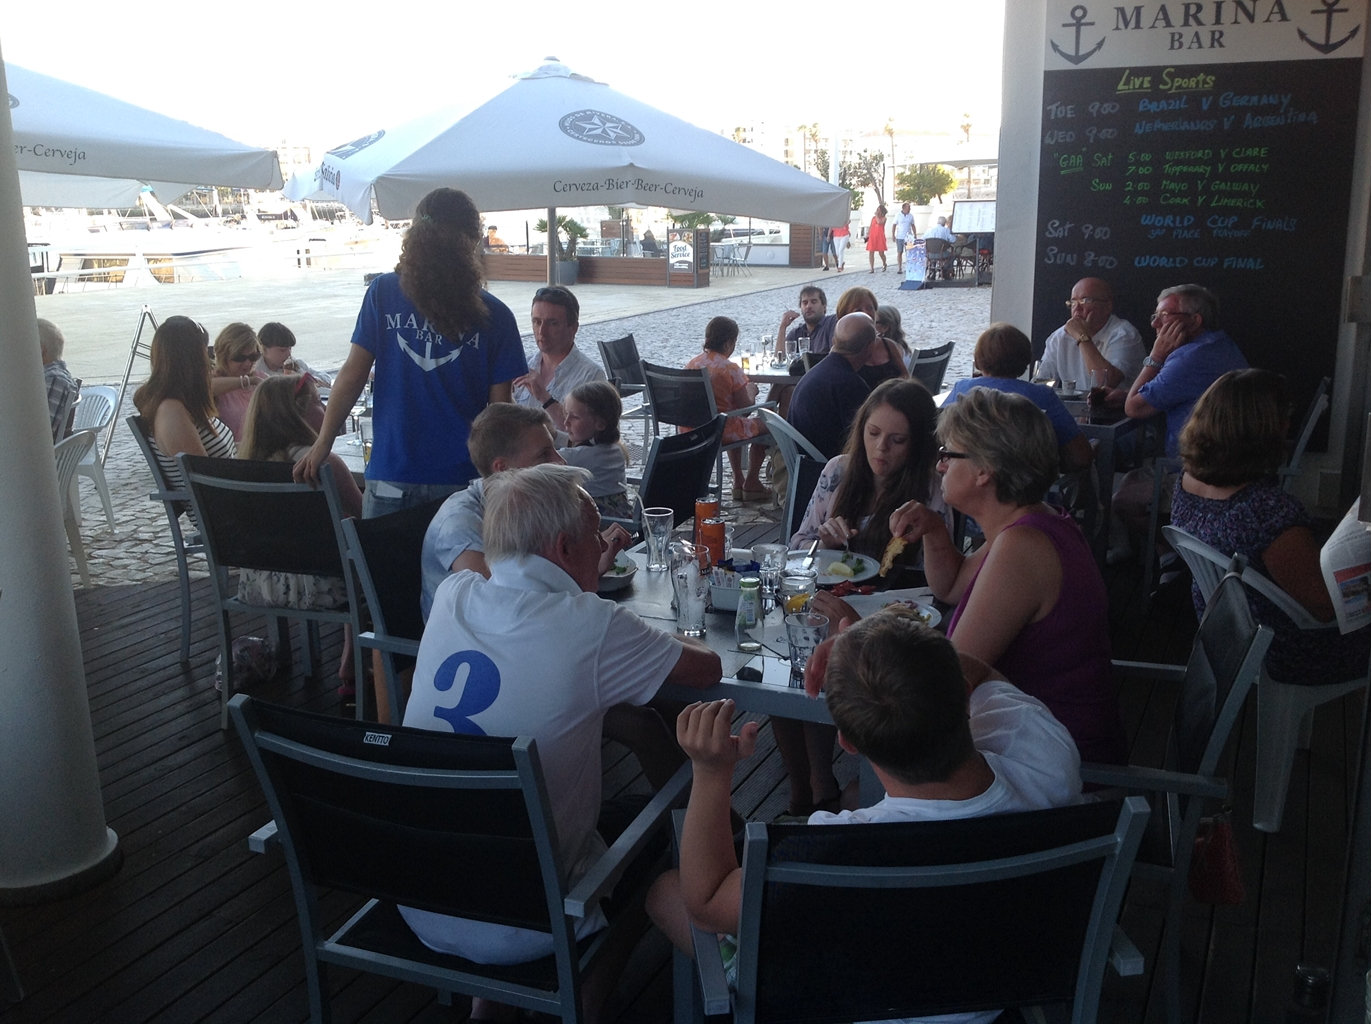 Marina Bar Lagos Friendly Bar in Lagos Portugal 3 - Sports Bar Lagos and Restaurant Bar Lagos Algarve portugal